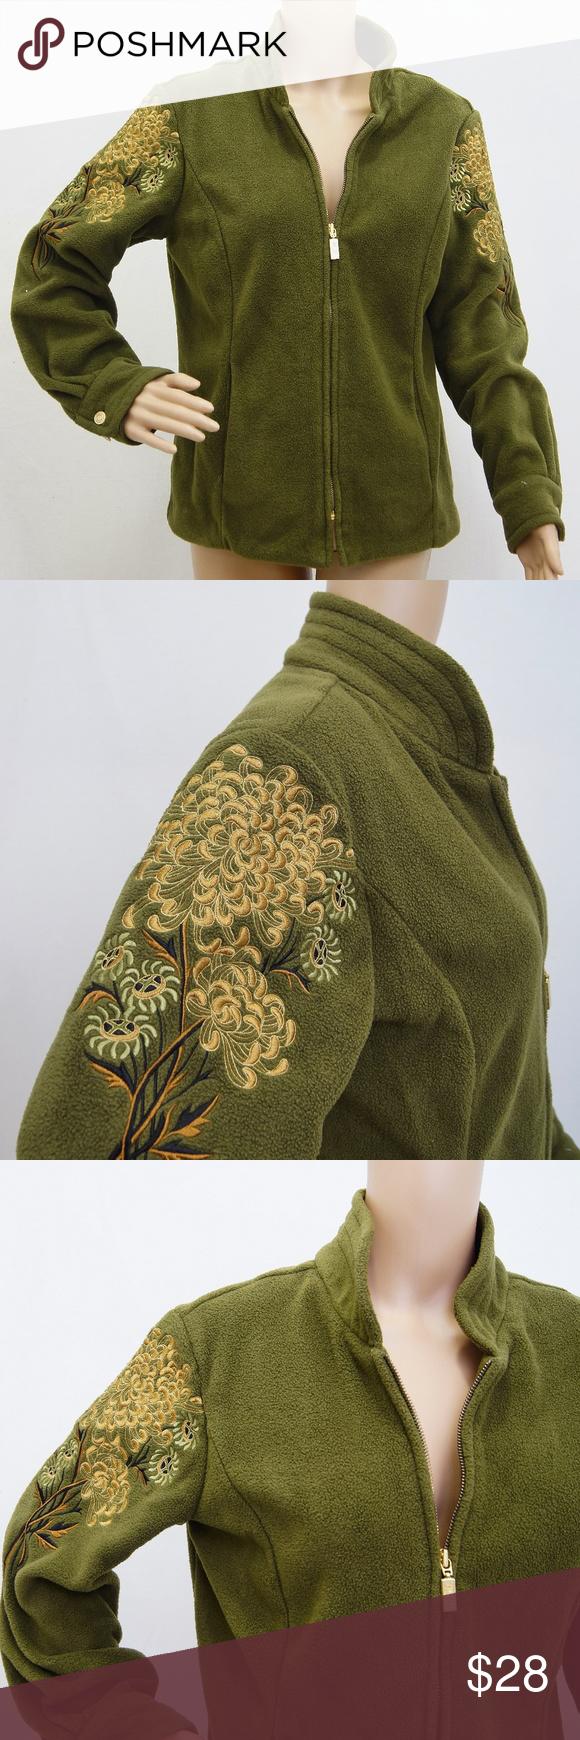 Bob Mackie Wearable Art Olive Green fleece jacket